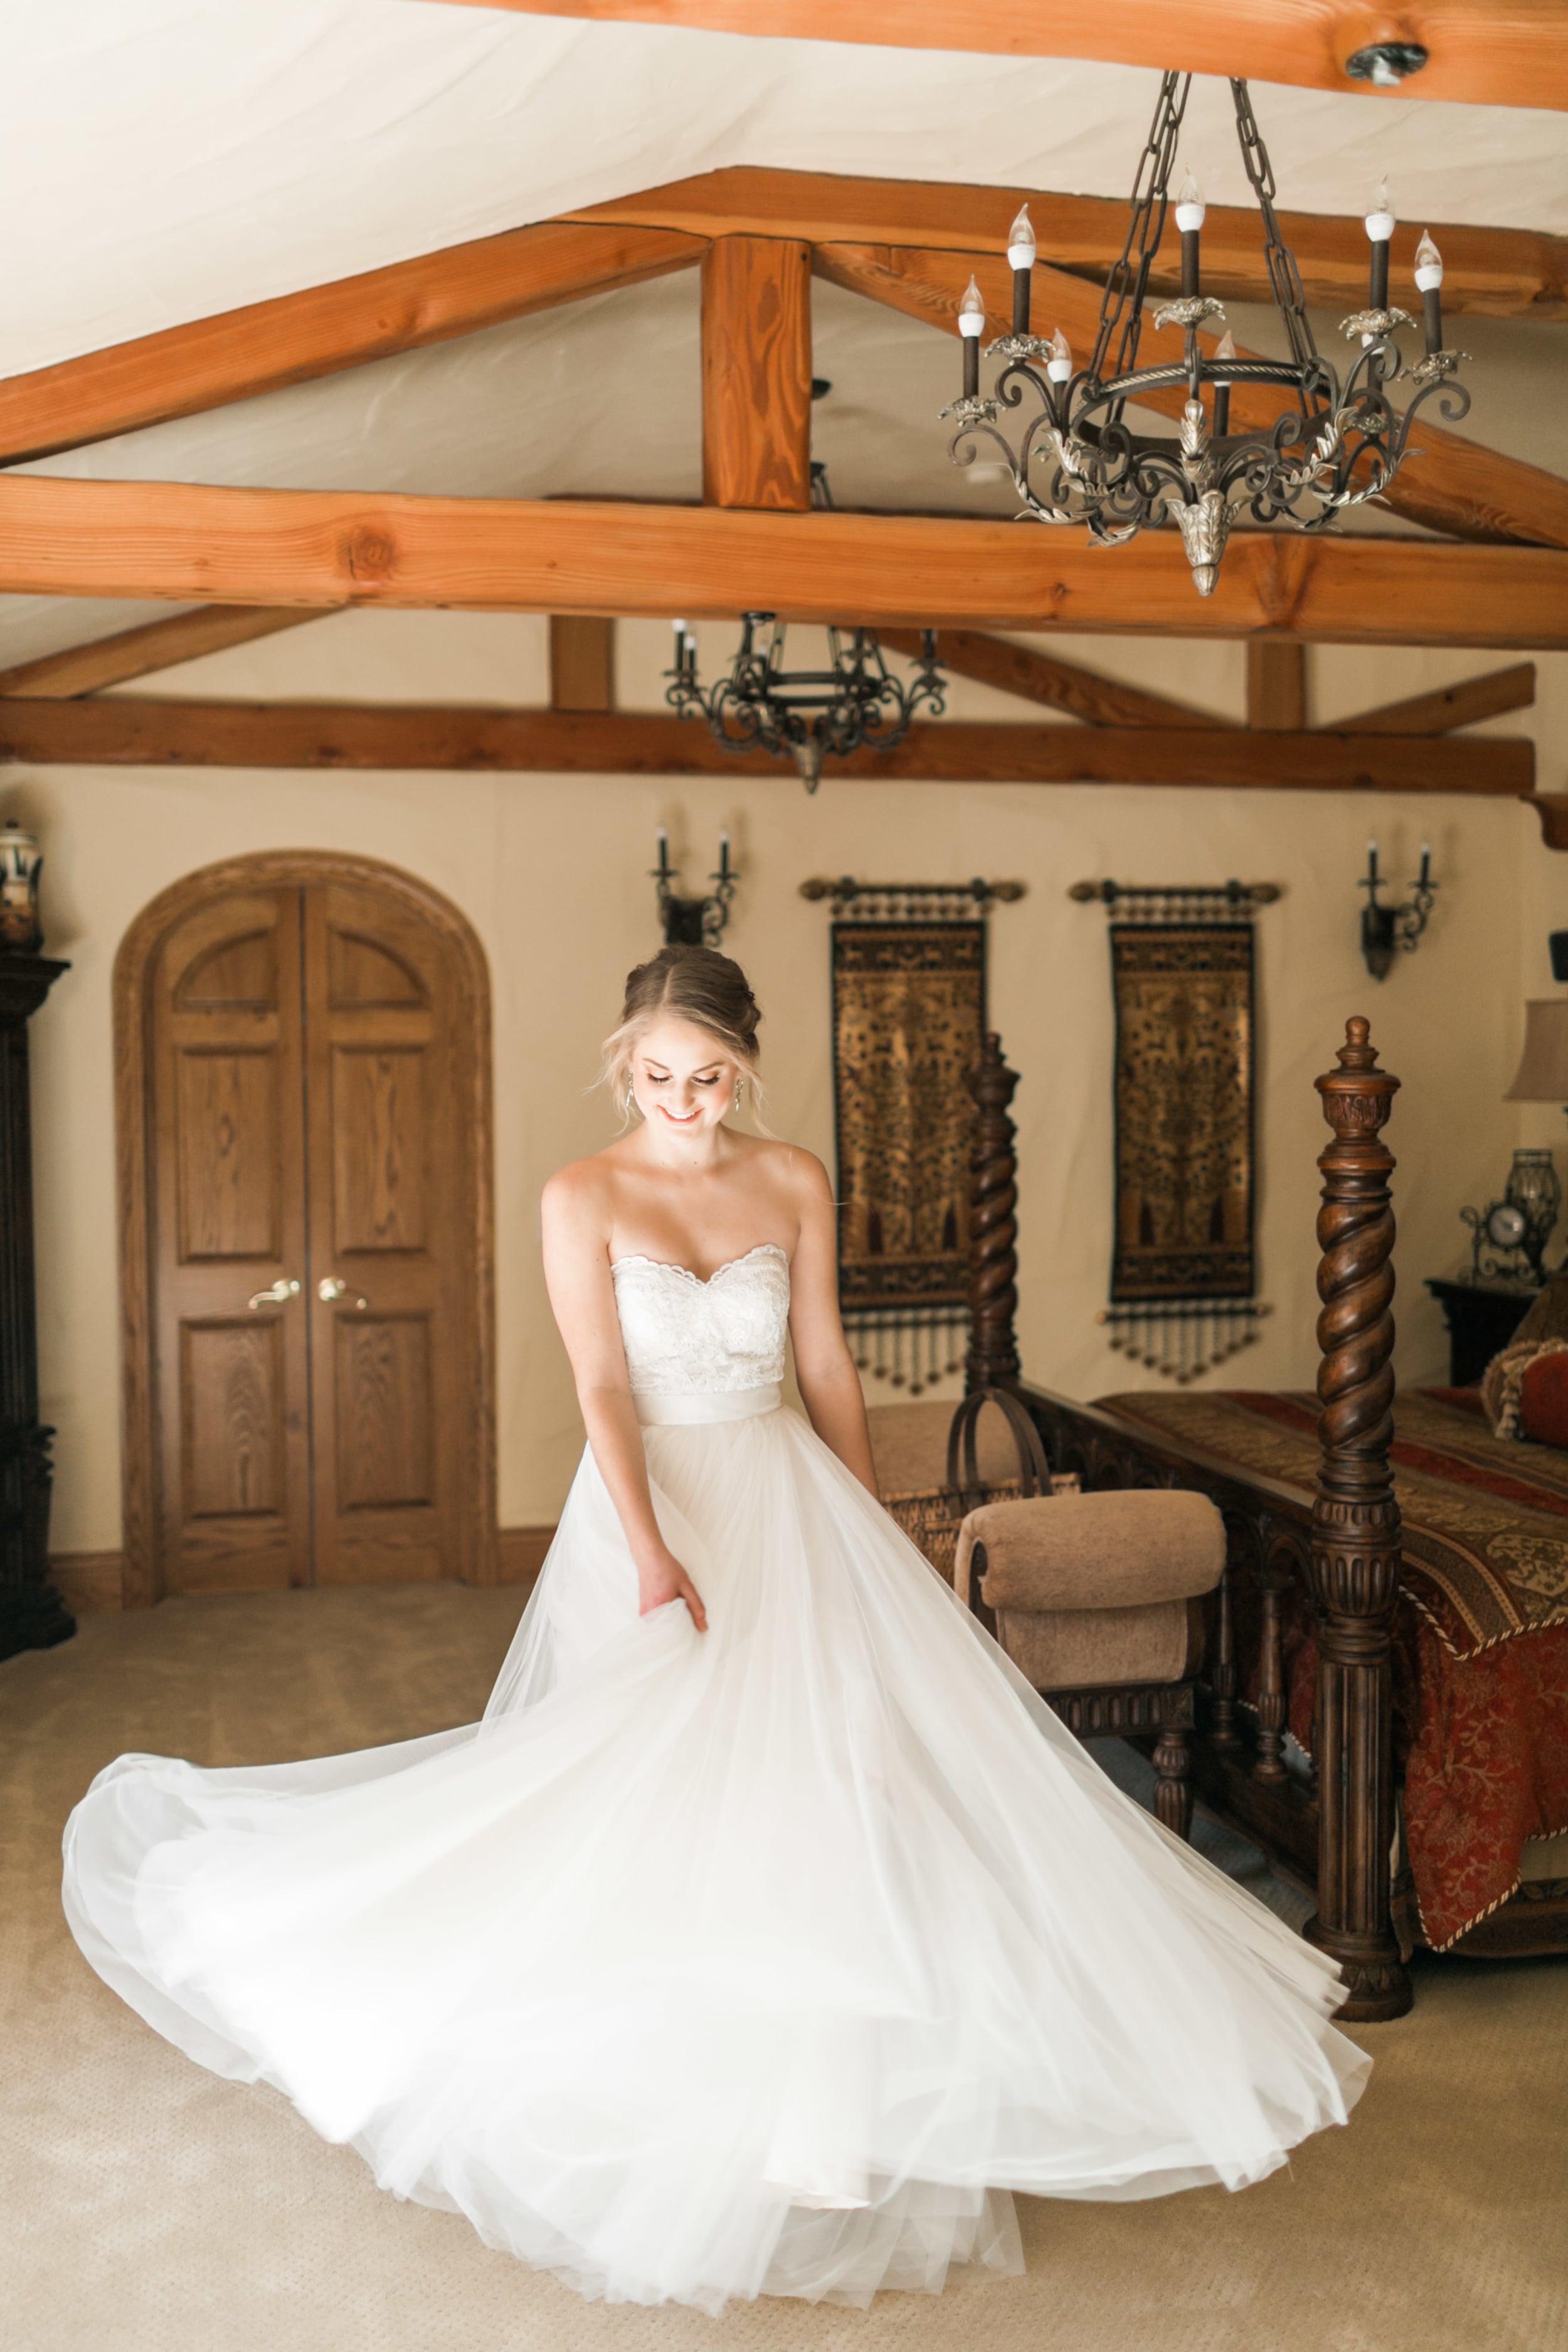 Natalie_Schutt_Photography_Winter_Wedding_San_Luis_Obispo-42.jpg